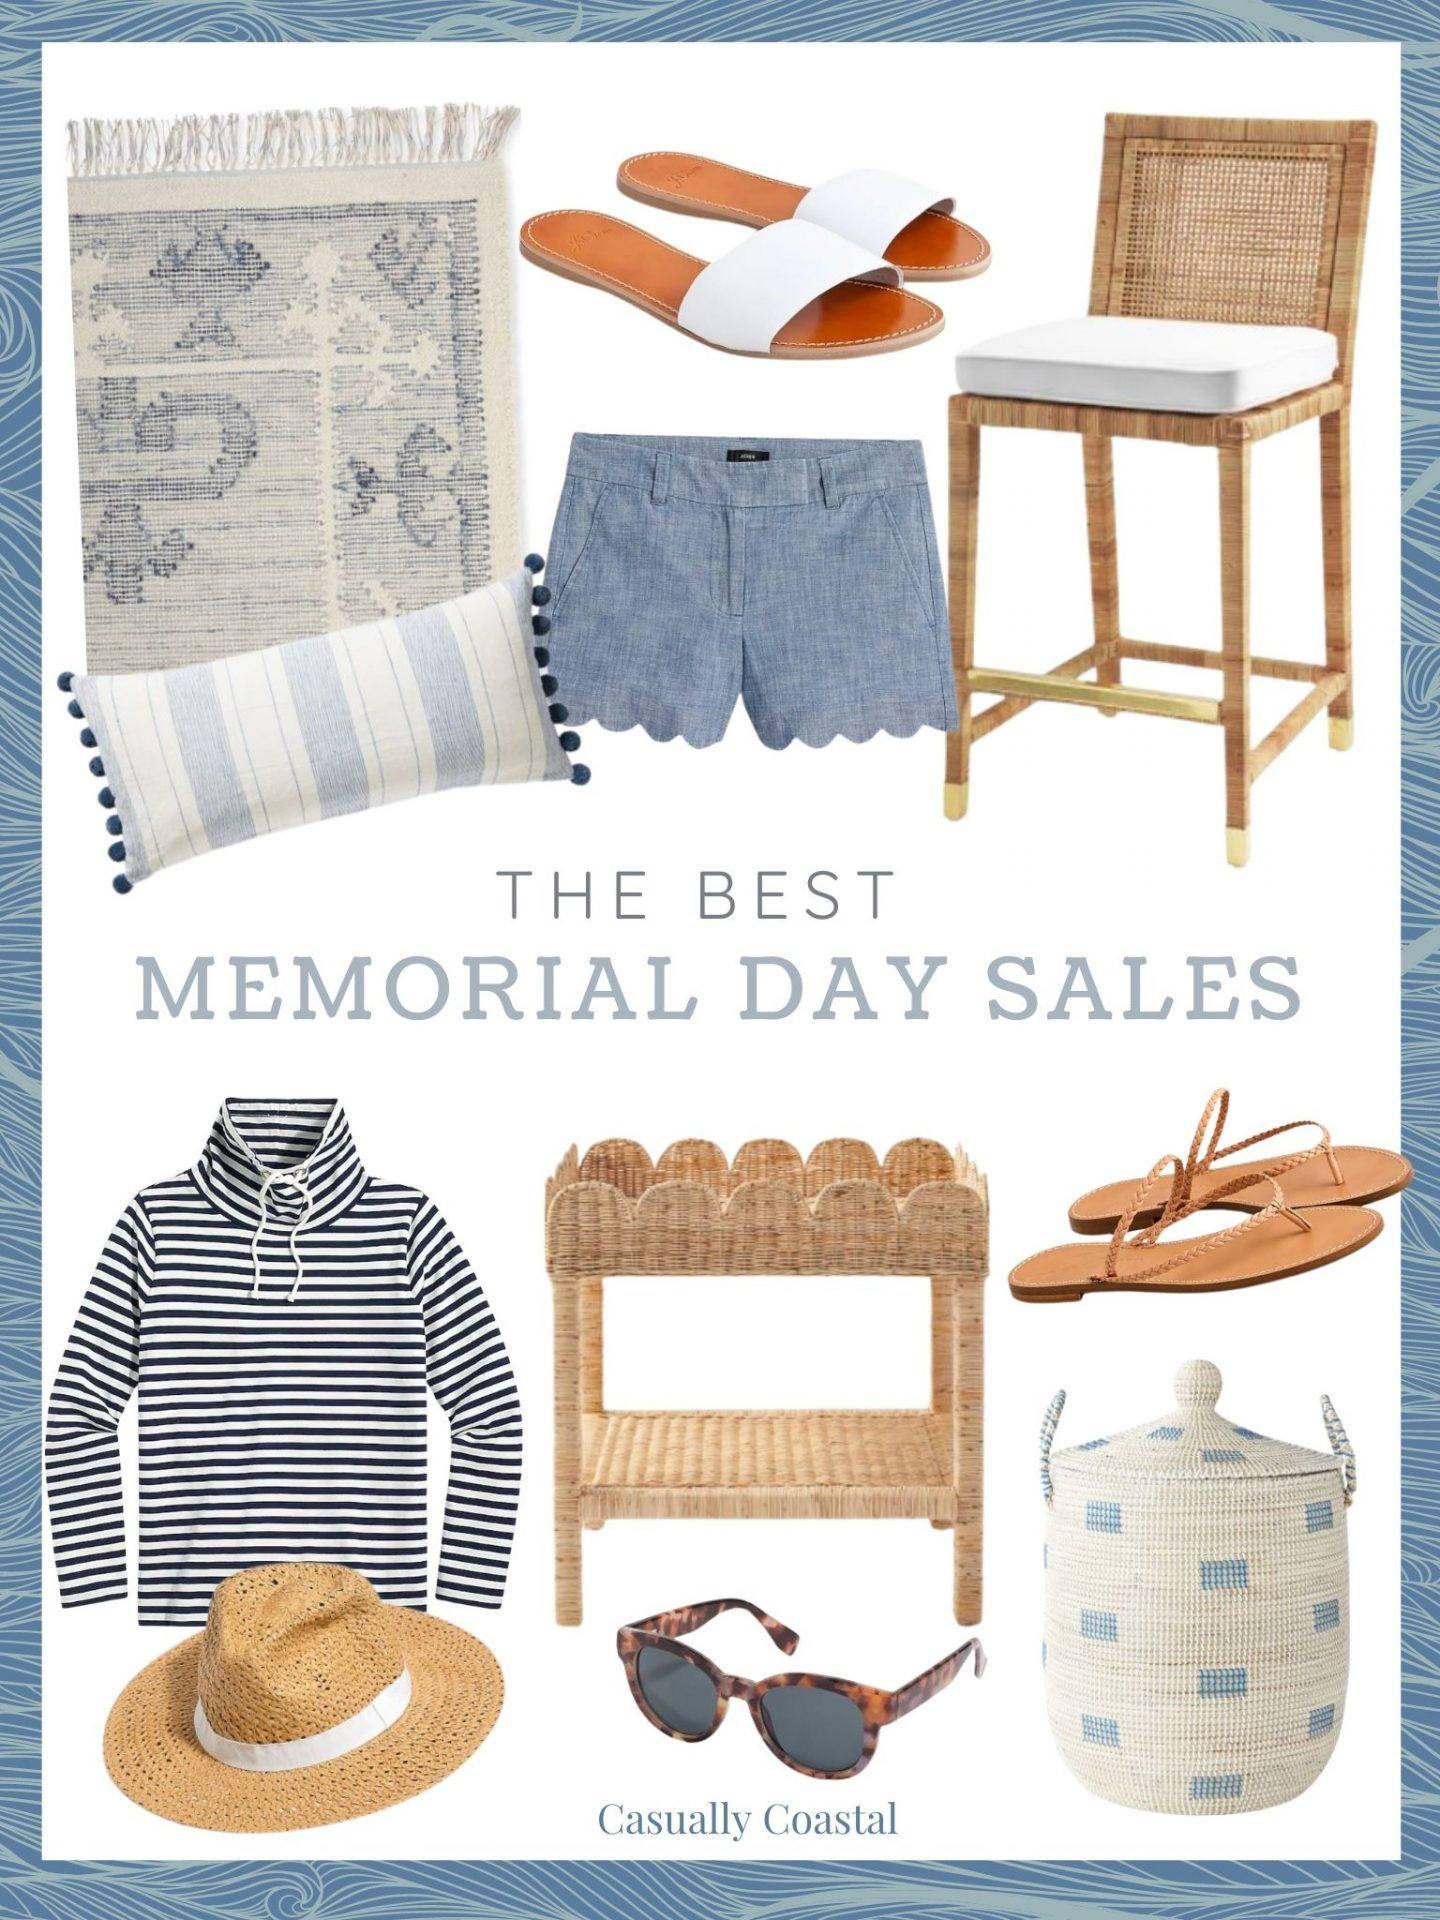 The Best Memorial Day Sales